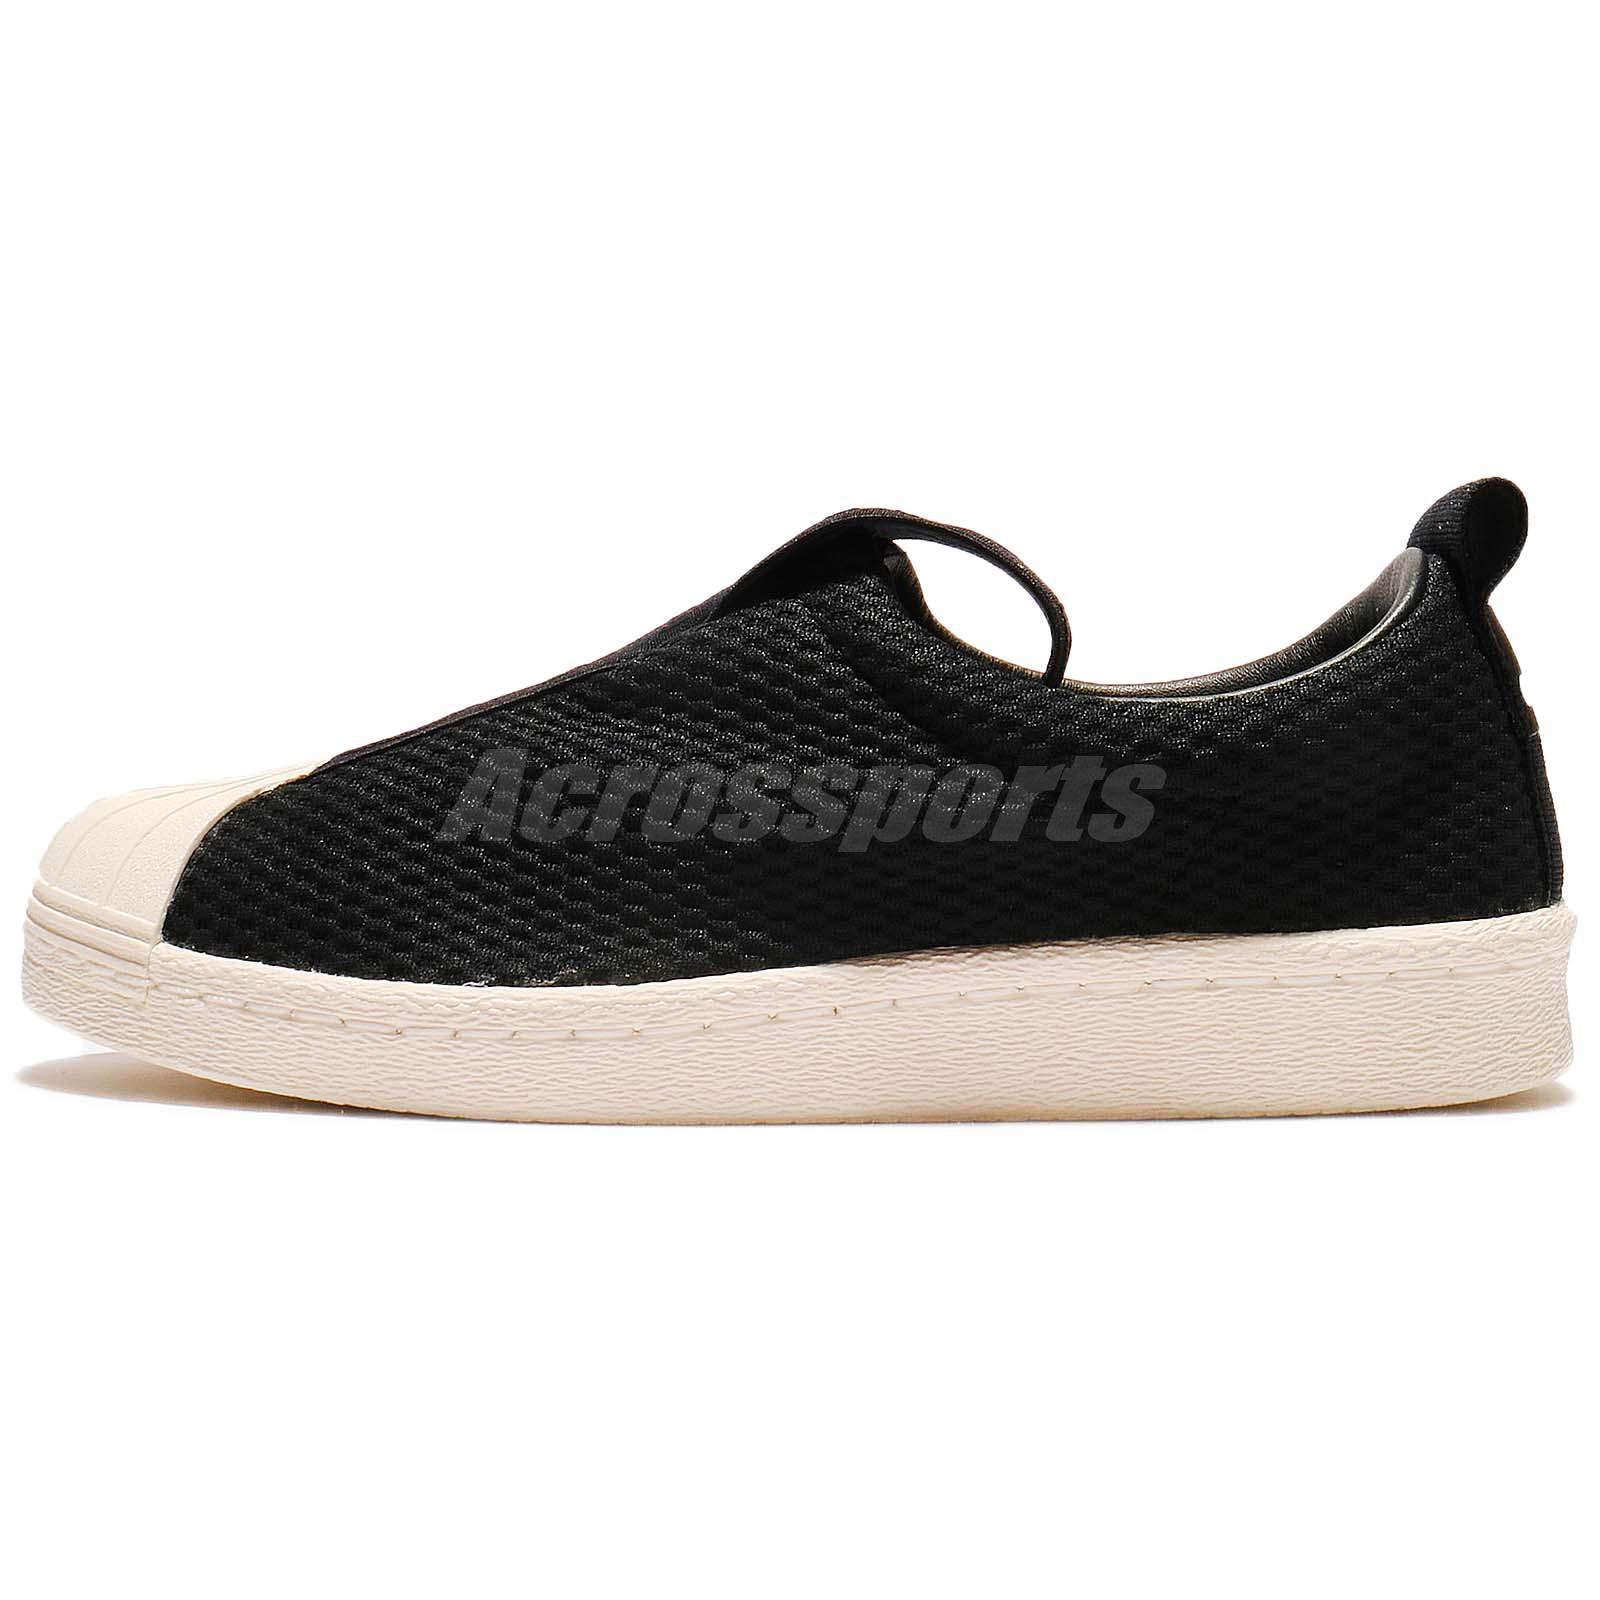 ADIDAS ORIGINALS SUPERSTAR BW35 Slip On W Black White Women Shoes Sneaker BY9137